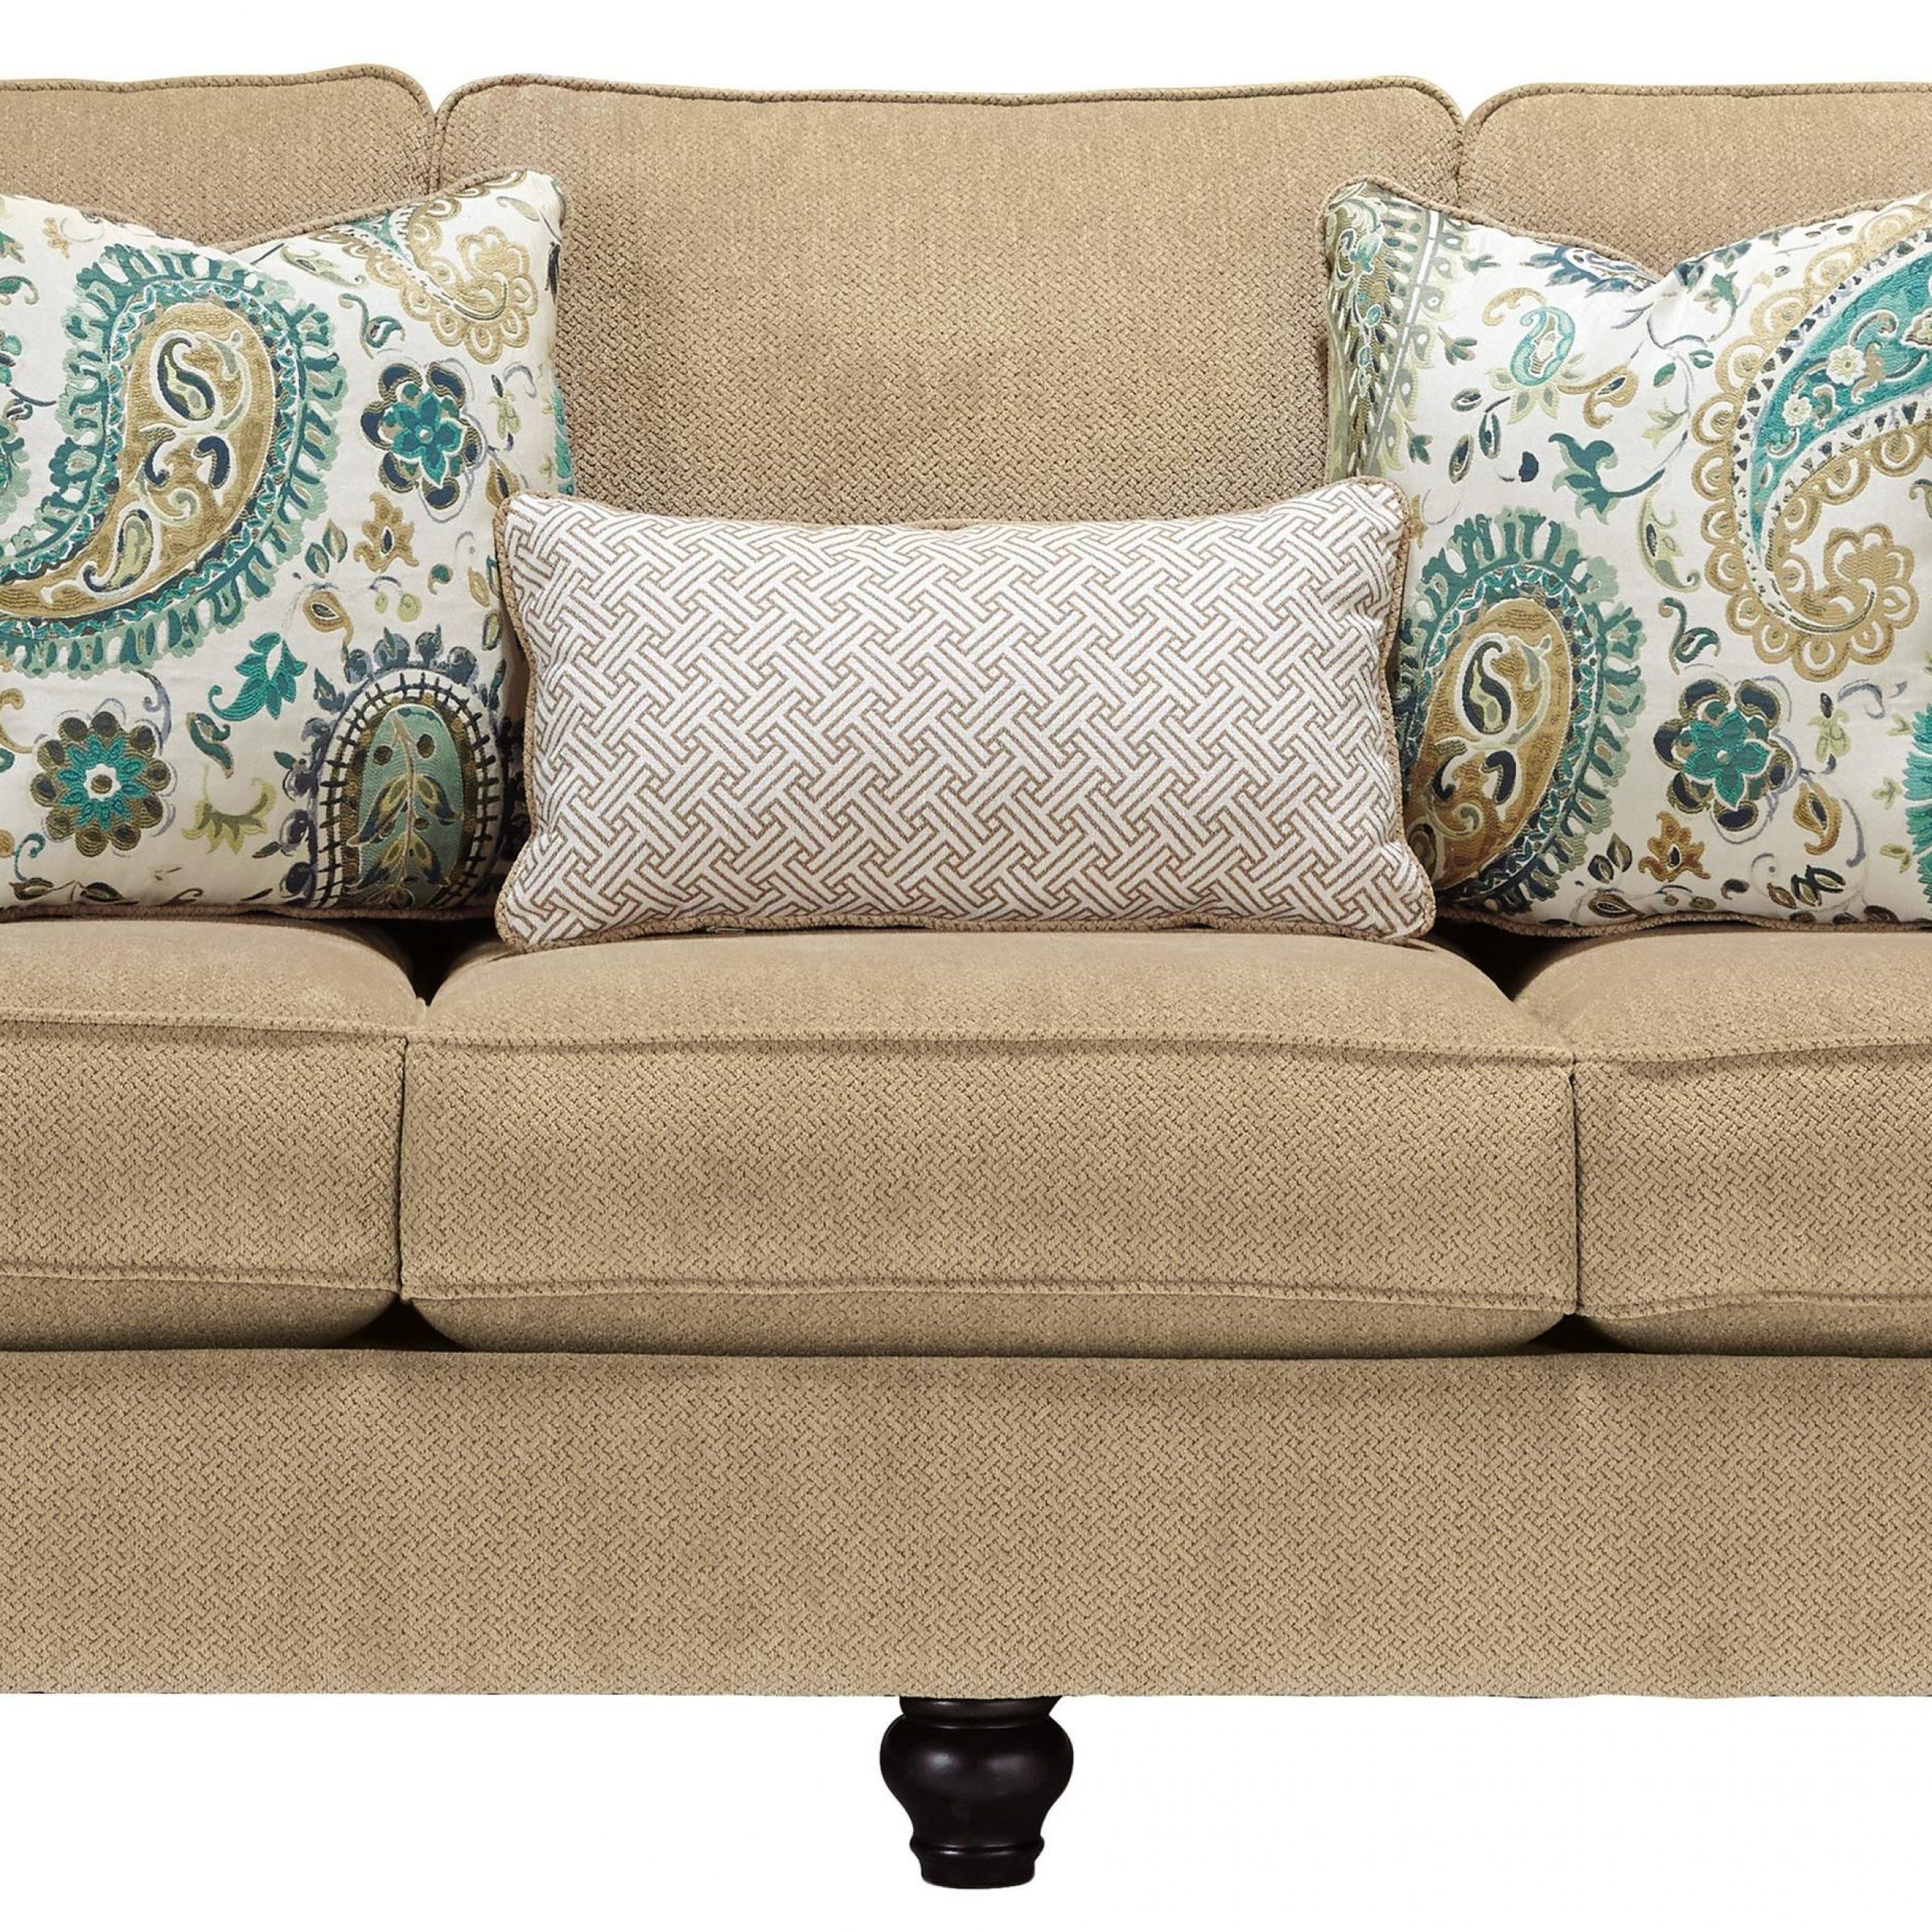 Lochian Sofa With Reversible Coil Seat Cushions & English Regarding Debbie Coil Sectional Futon Sofas (Photo 14 of 15)